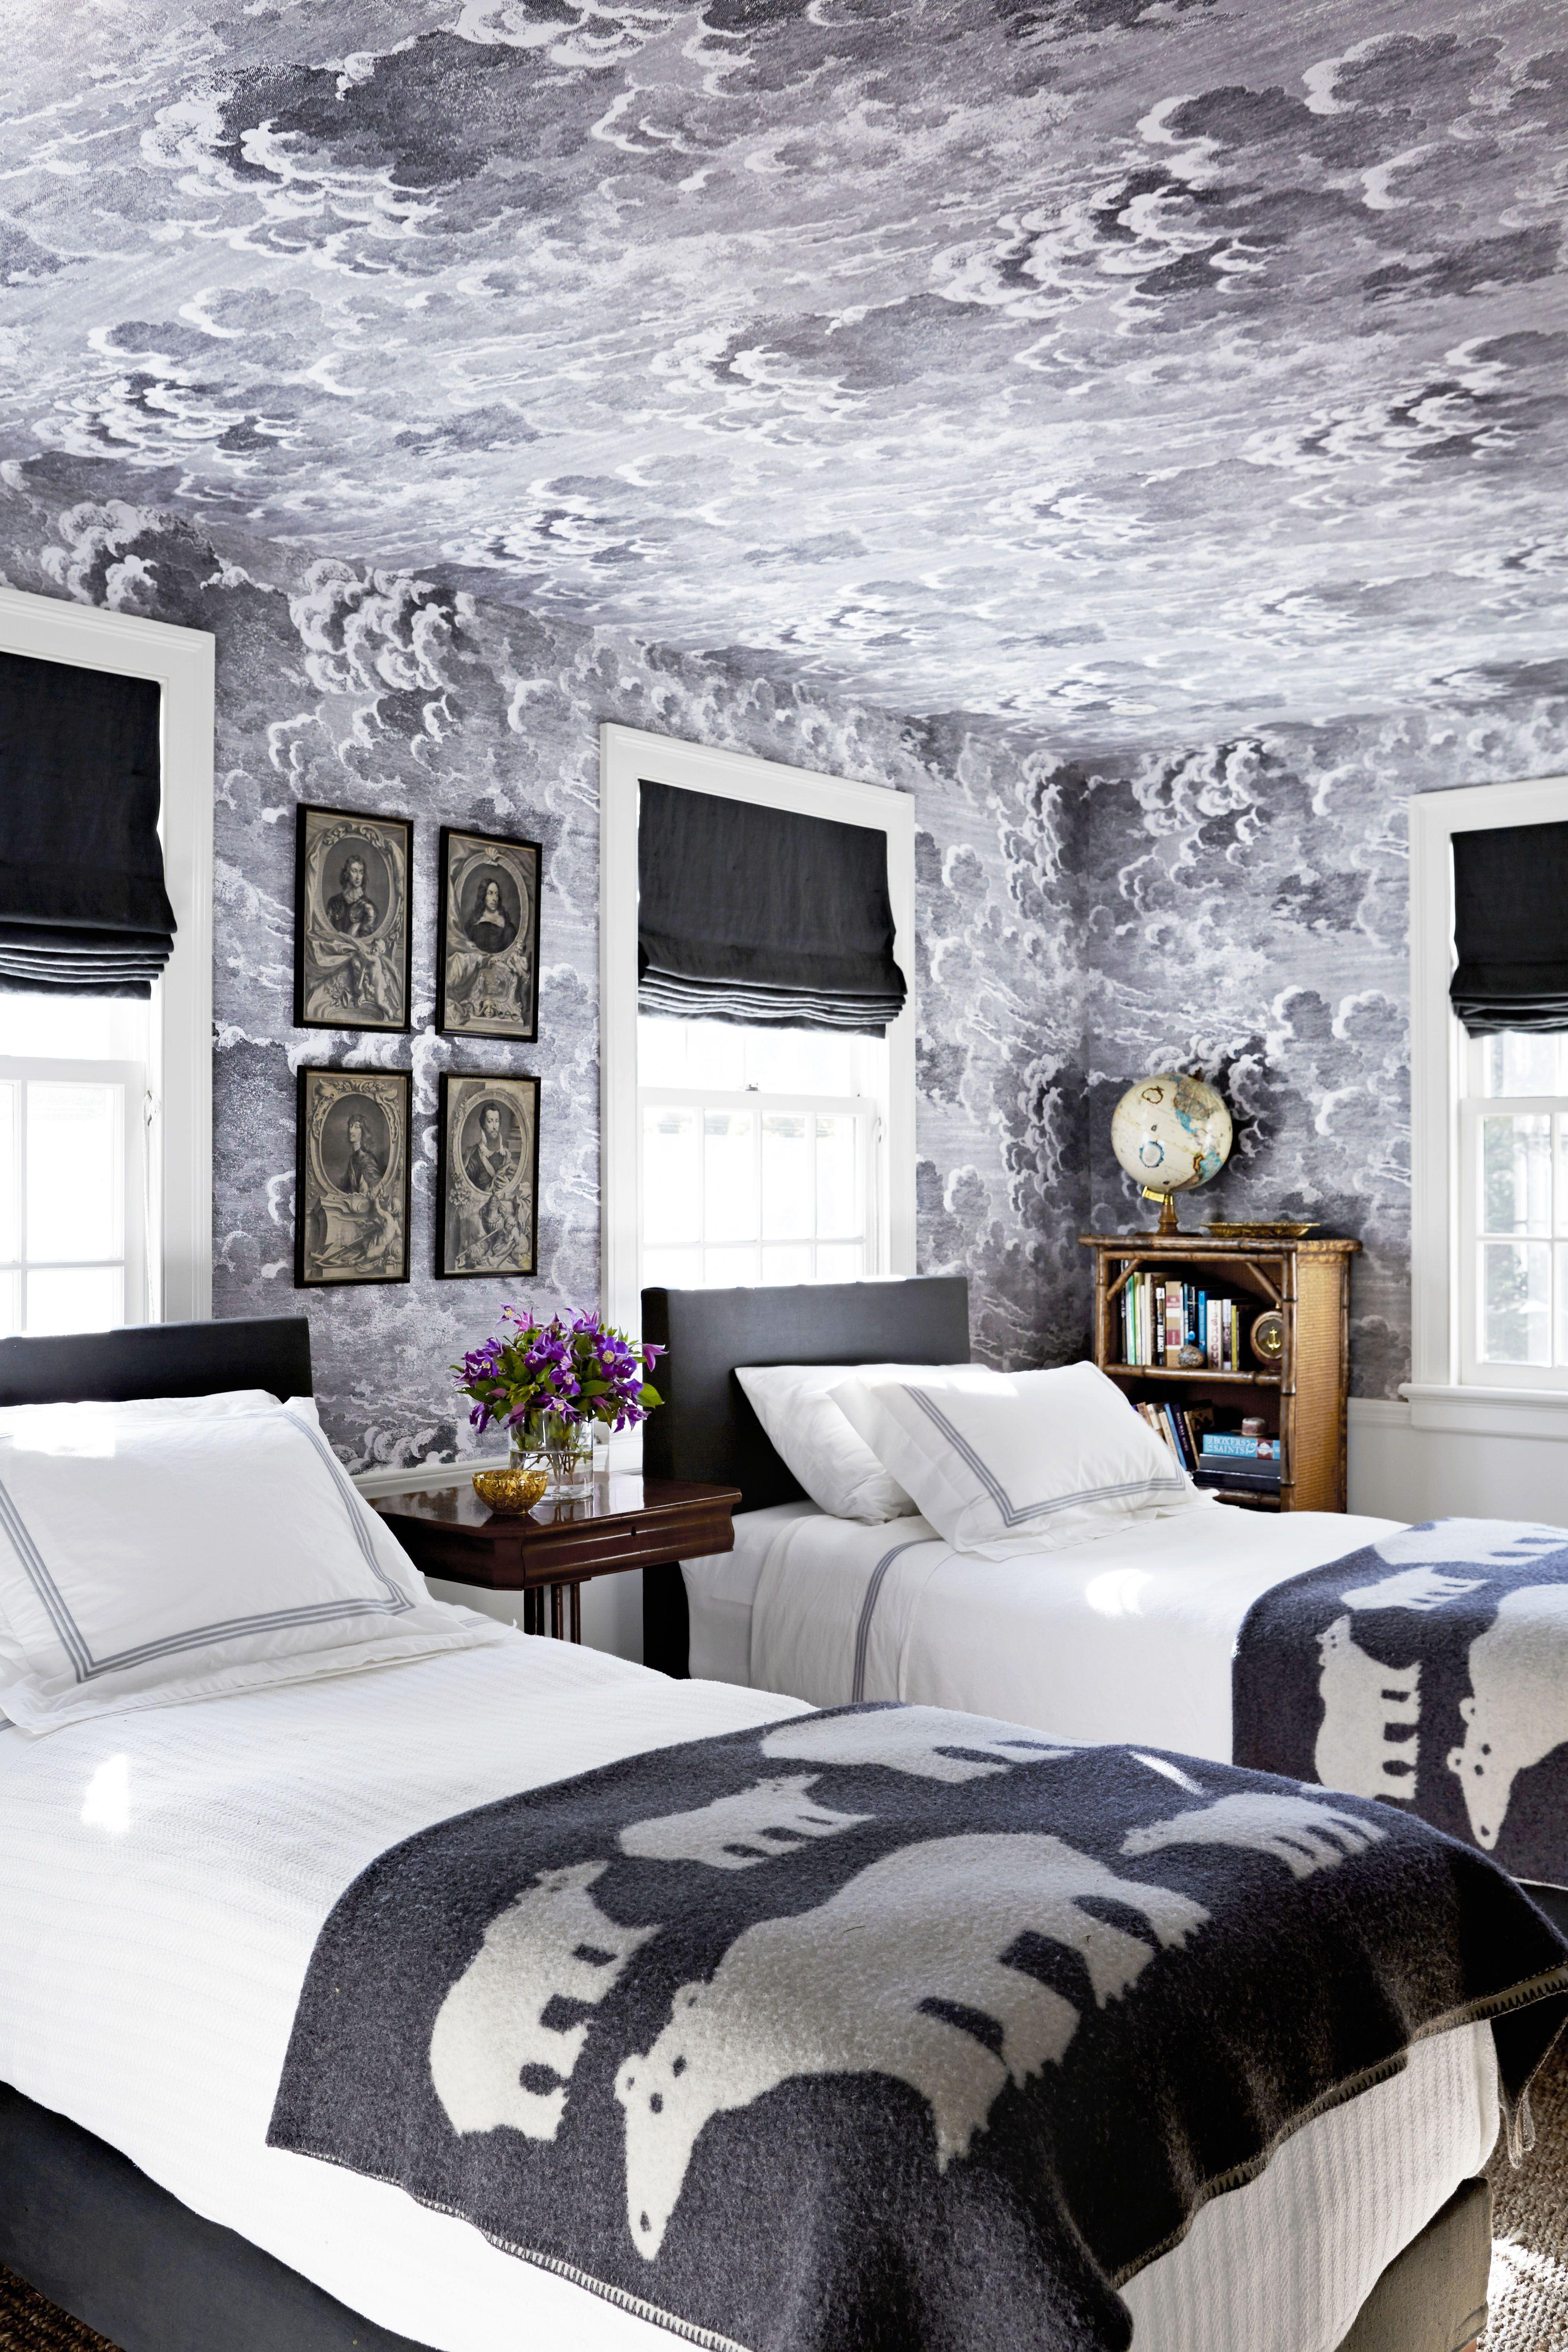 52 Best Interior Decorating Secrets , Decorating Tips and